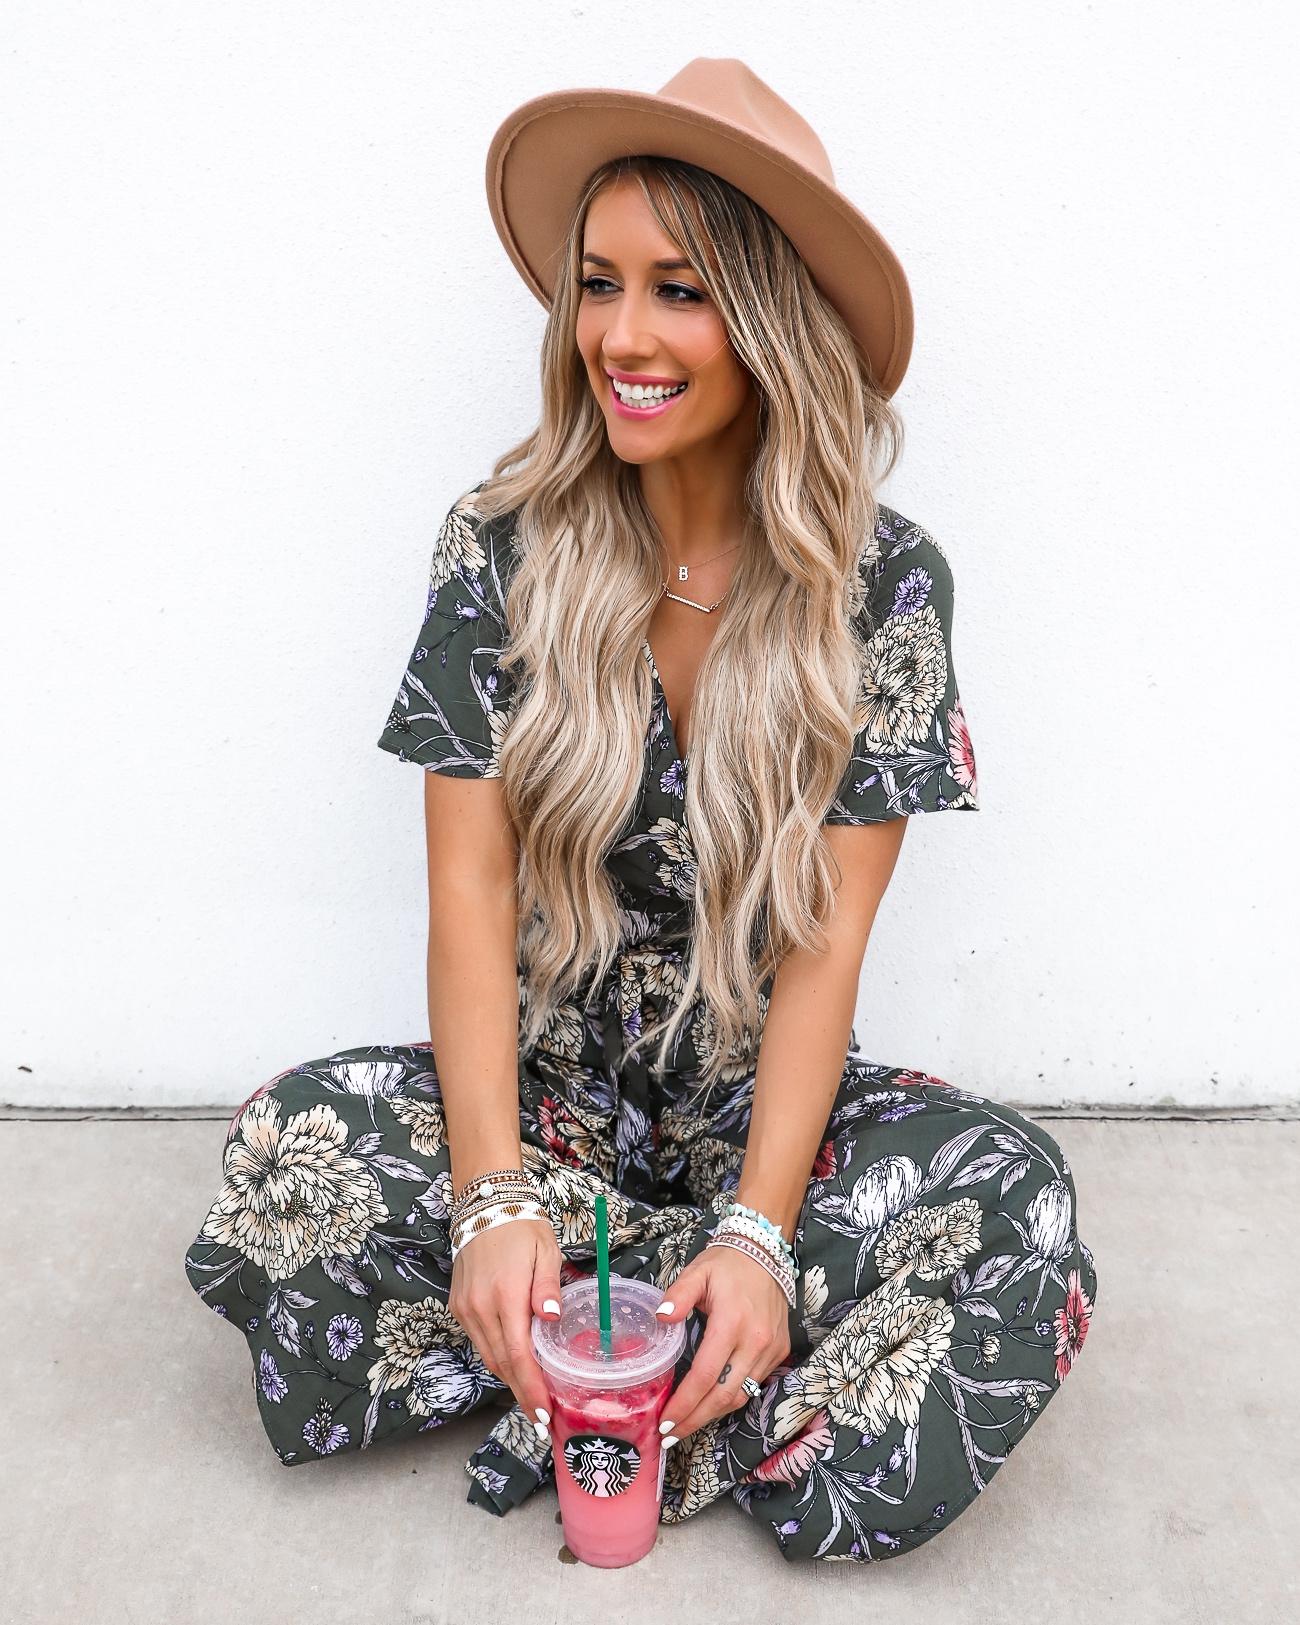 Victoria Emerson Bracelets Spring & summer outfit idea Floral Jumpsuit Starbucks Pink Drink Laura Beverlin1